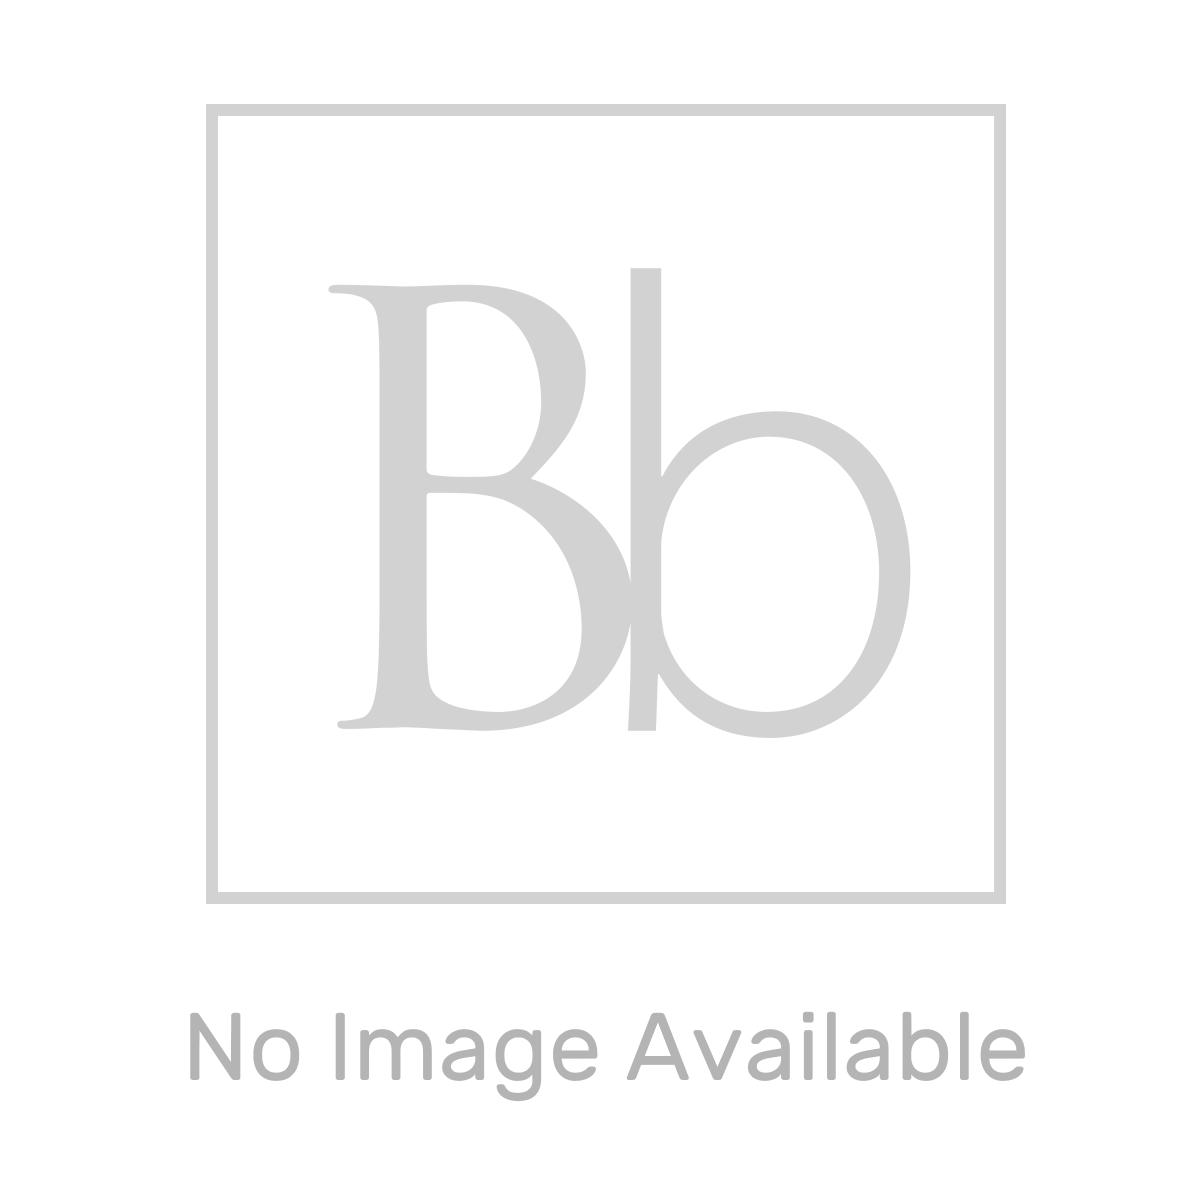 RAK Rubens Illuminated LED Bevel Edged Mirror 800 x 600mm